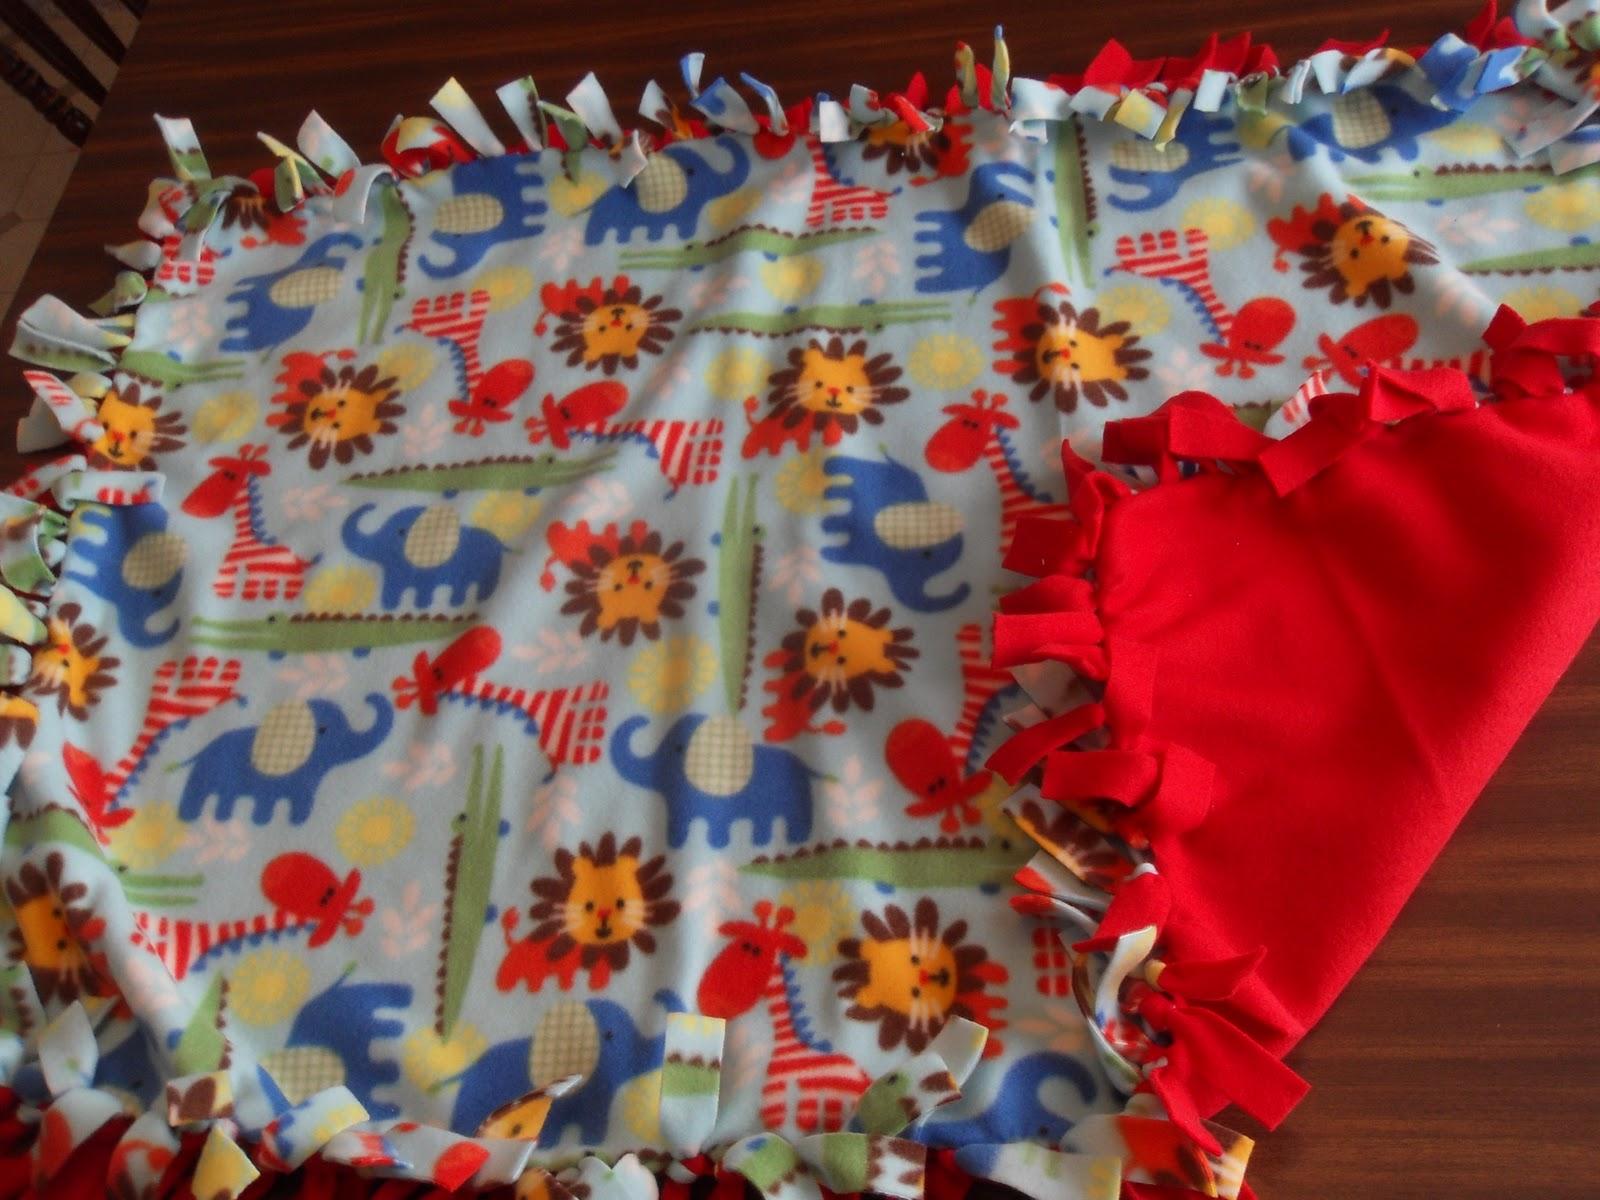 Simple Joy Crafting Fleece Tie Blankets For Charity